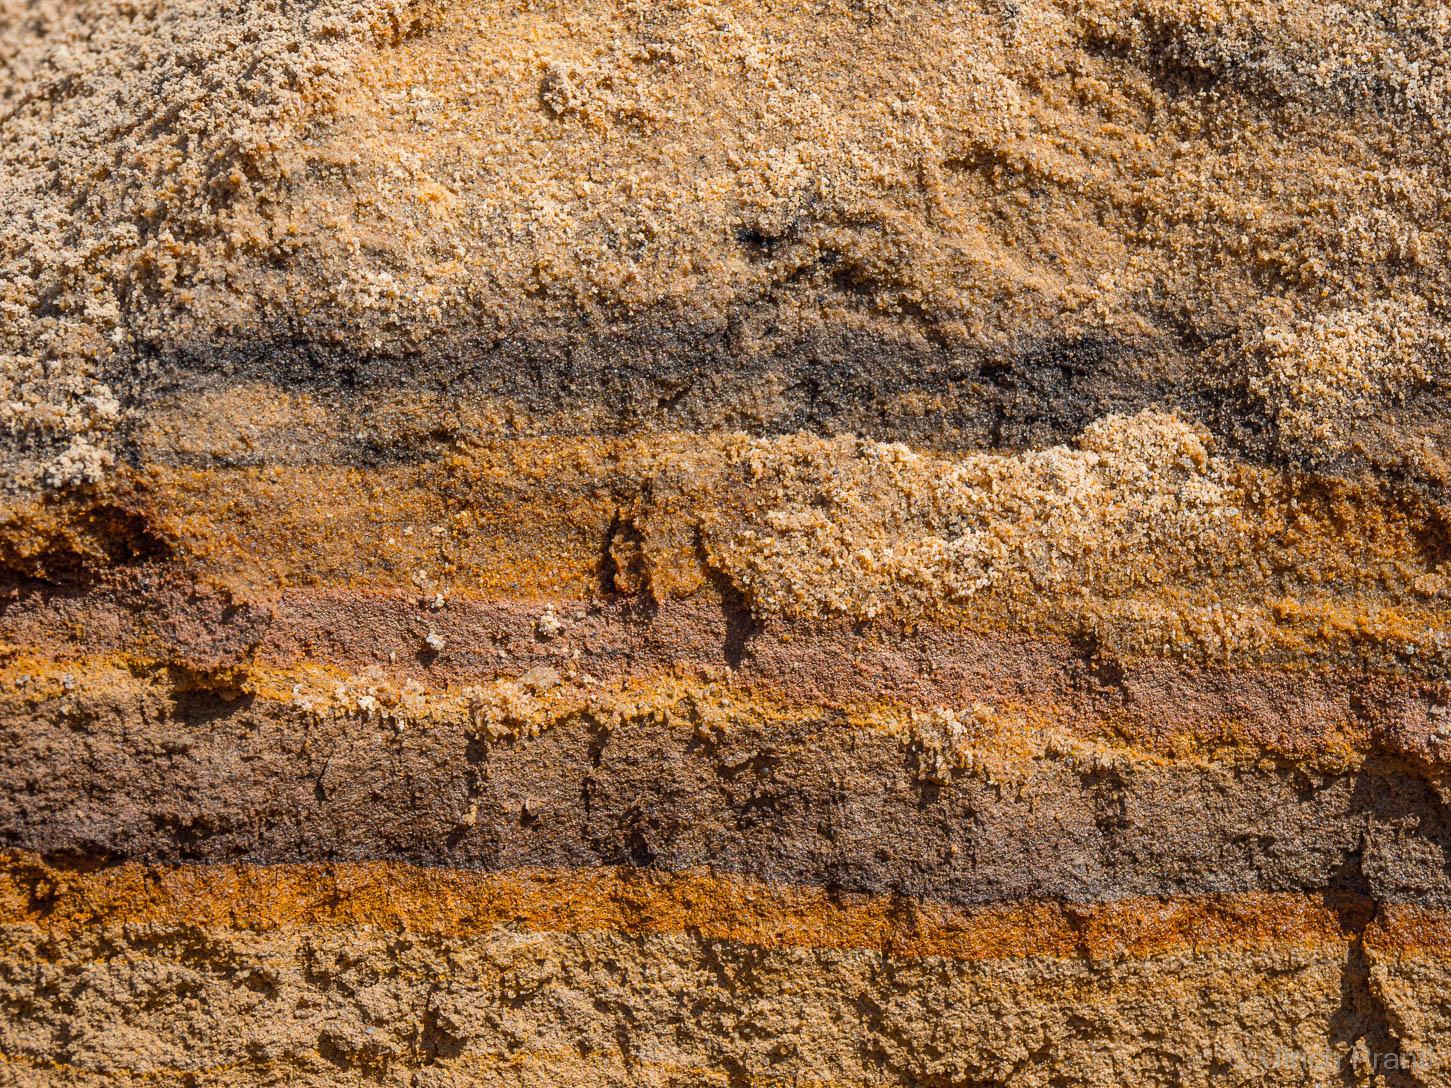 Sandgrube Alzenau, Bunte Sande